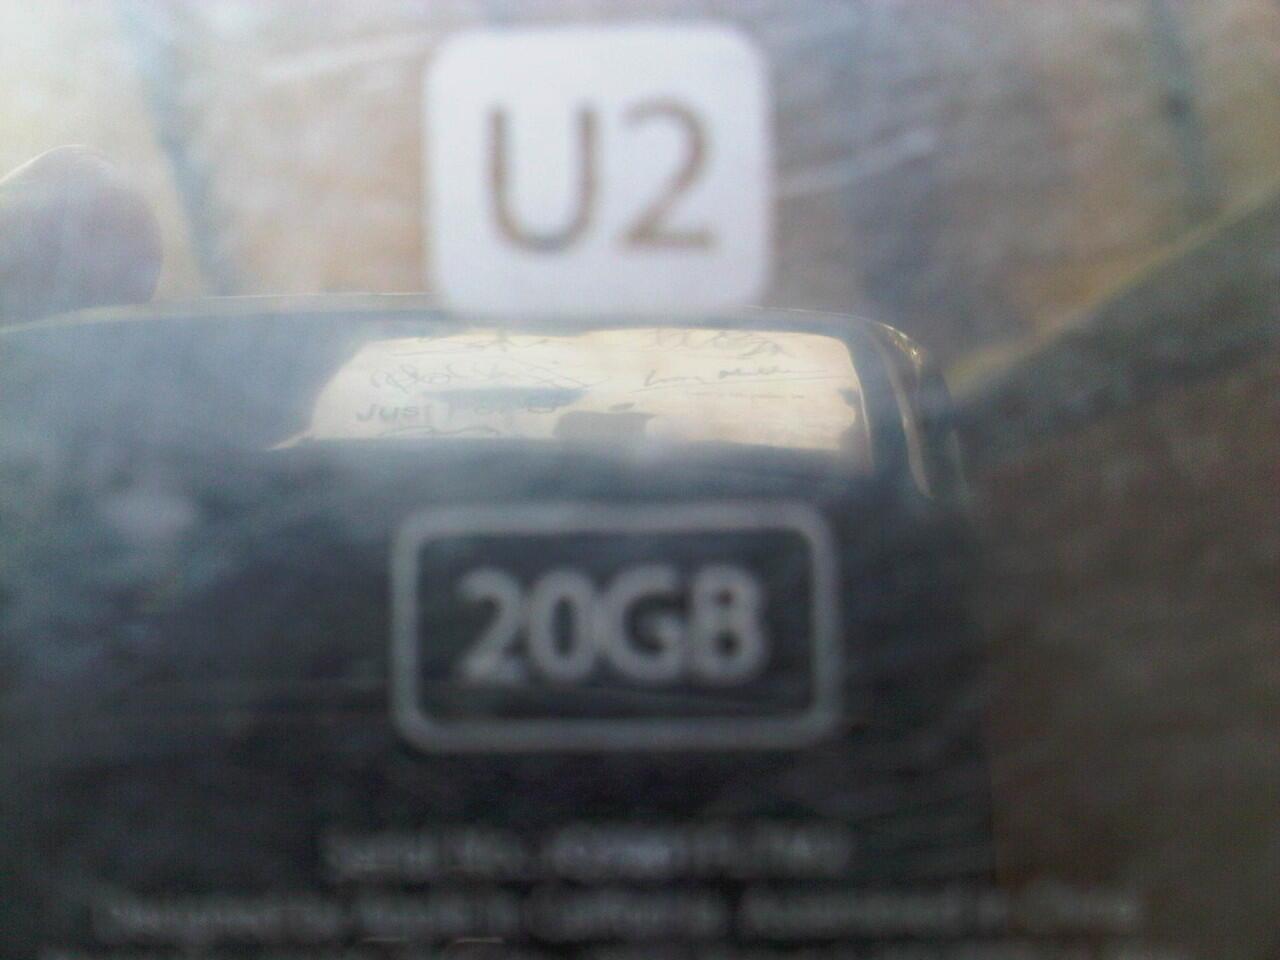 IPOD CLASSIC Gen 4th U2 Edition 20GB [Wolfson] ||Collector wajib Masuk ||Depok